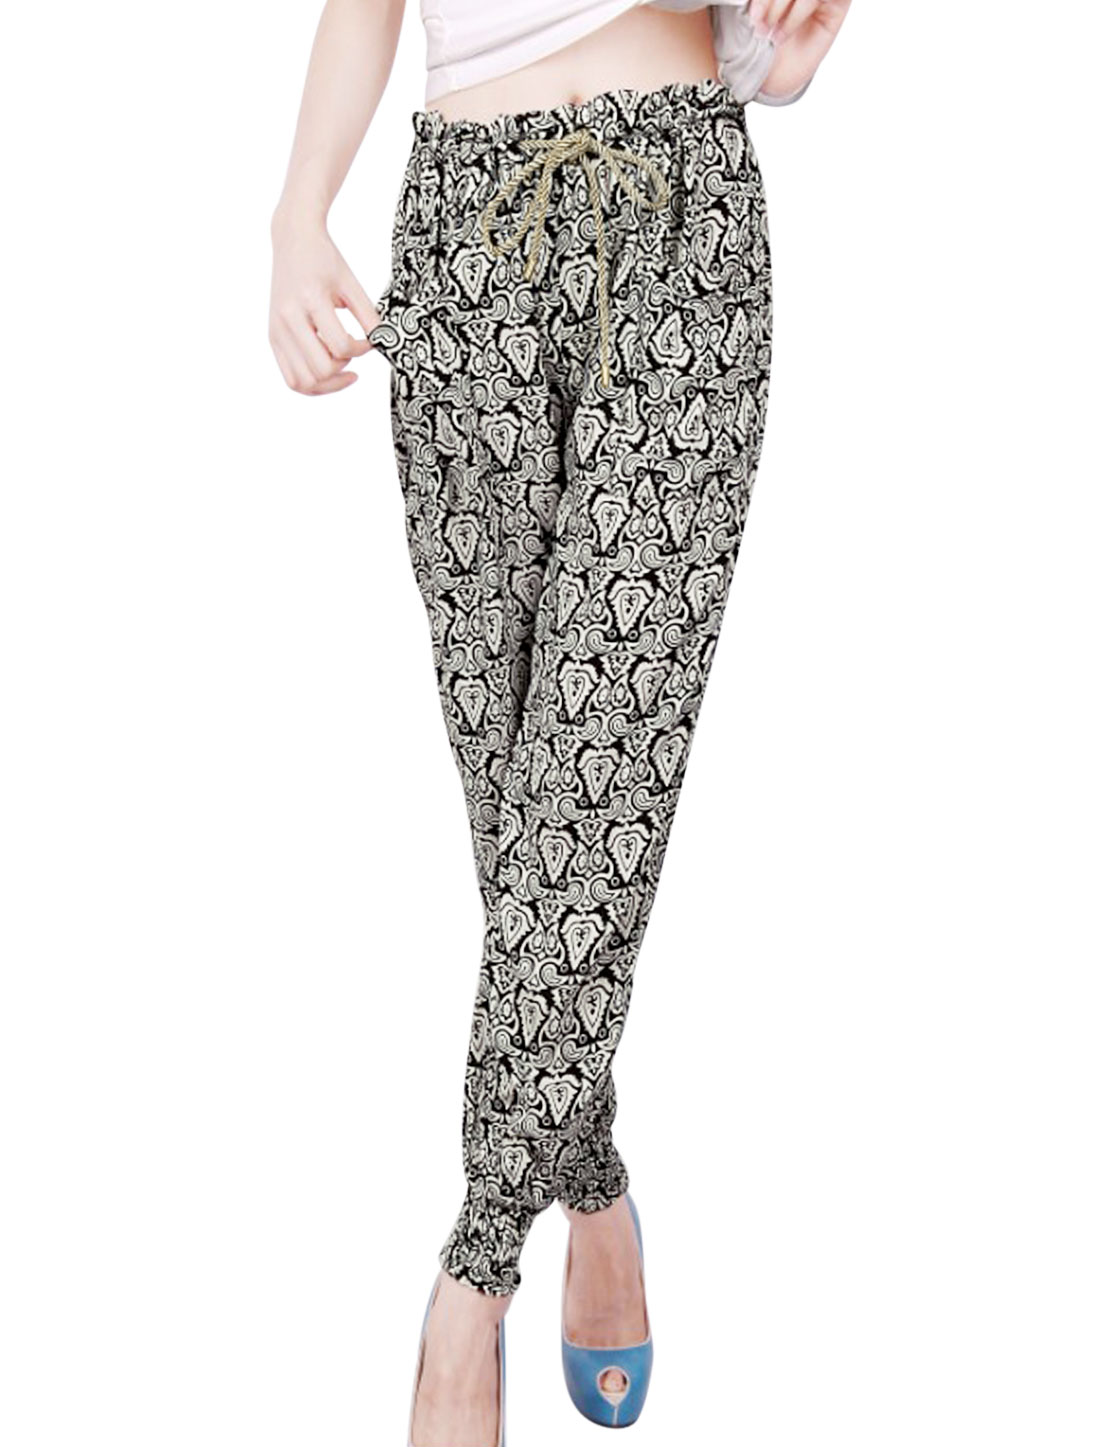 Women Drawstring Waist Flower Pattern Summer Fit Jogger Pants Beige Black XS